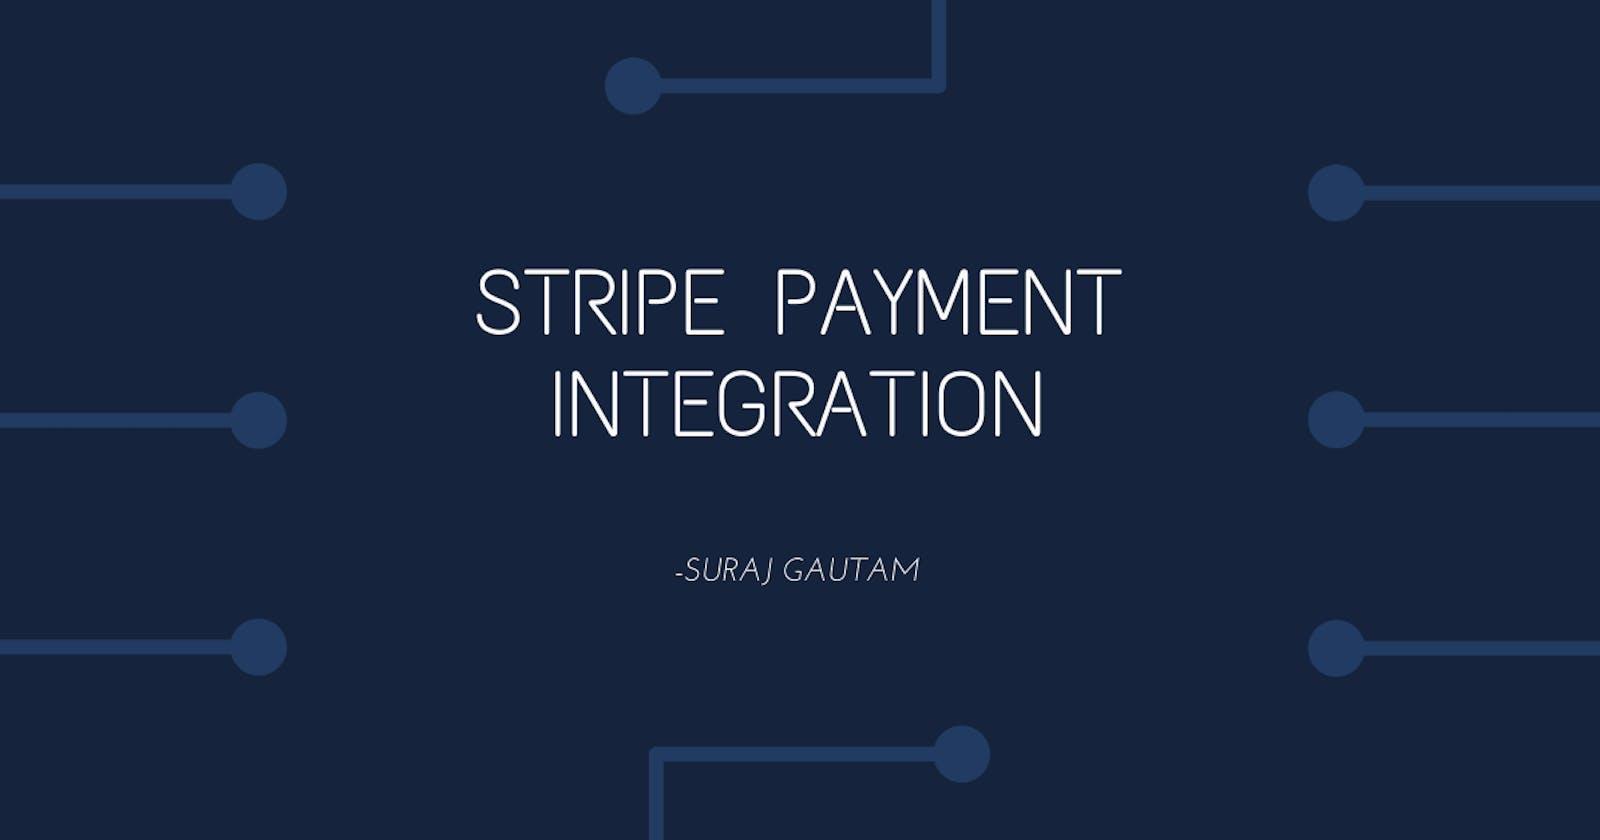 Stripe Payment Integration